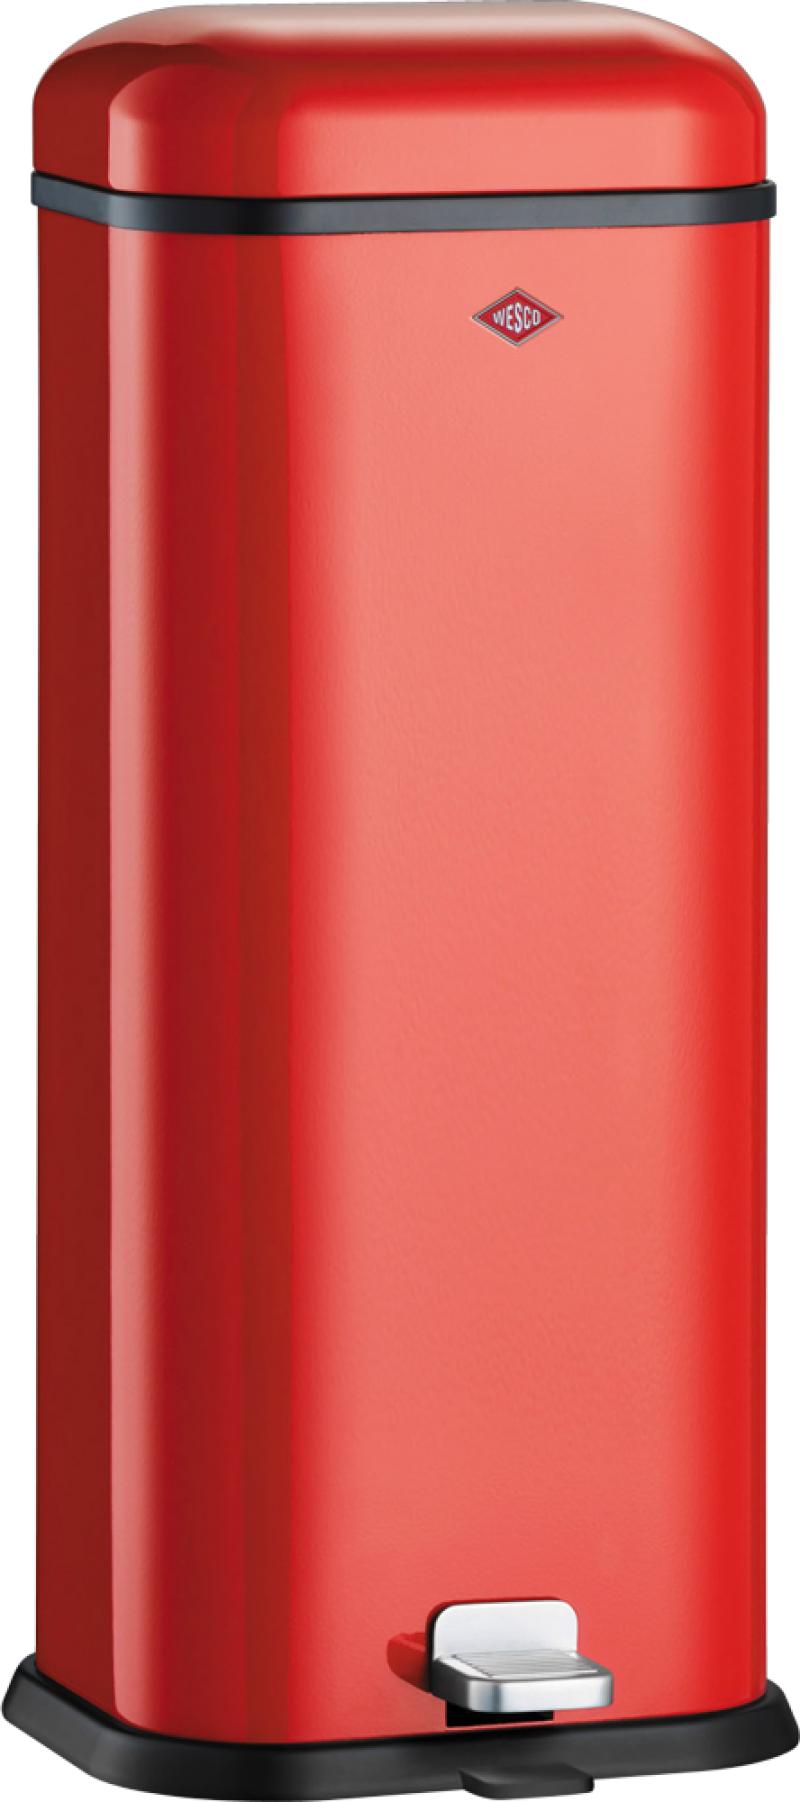 wesco superboy 20l m lleimer rot hammerkauf. Black Bedroom Furniture Sets. Home Design Ideas